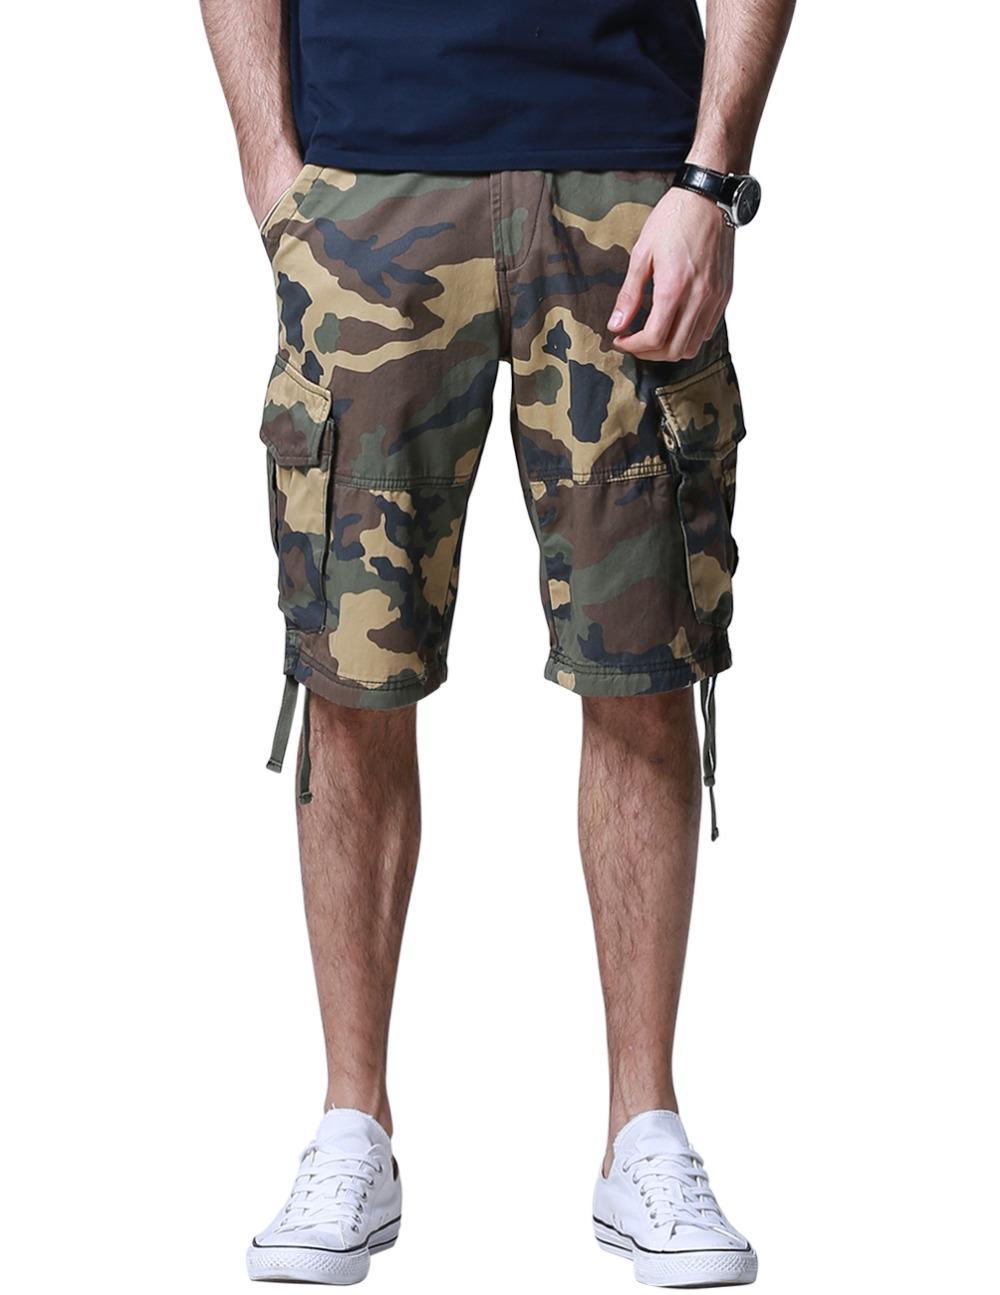 d67a7498c6e 2019 Wholesale Match Men S Camouflage Cargo Shorts Bermudas Hombre Casual Shorts  Plus Size 38 40 42 44 S3596M From Odeletta